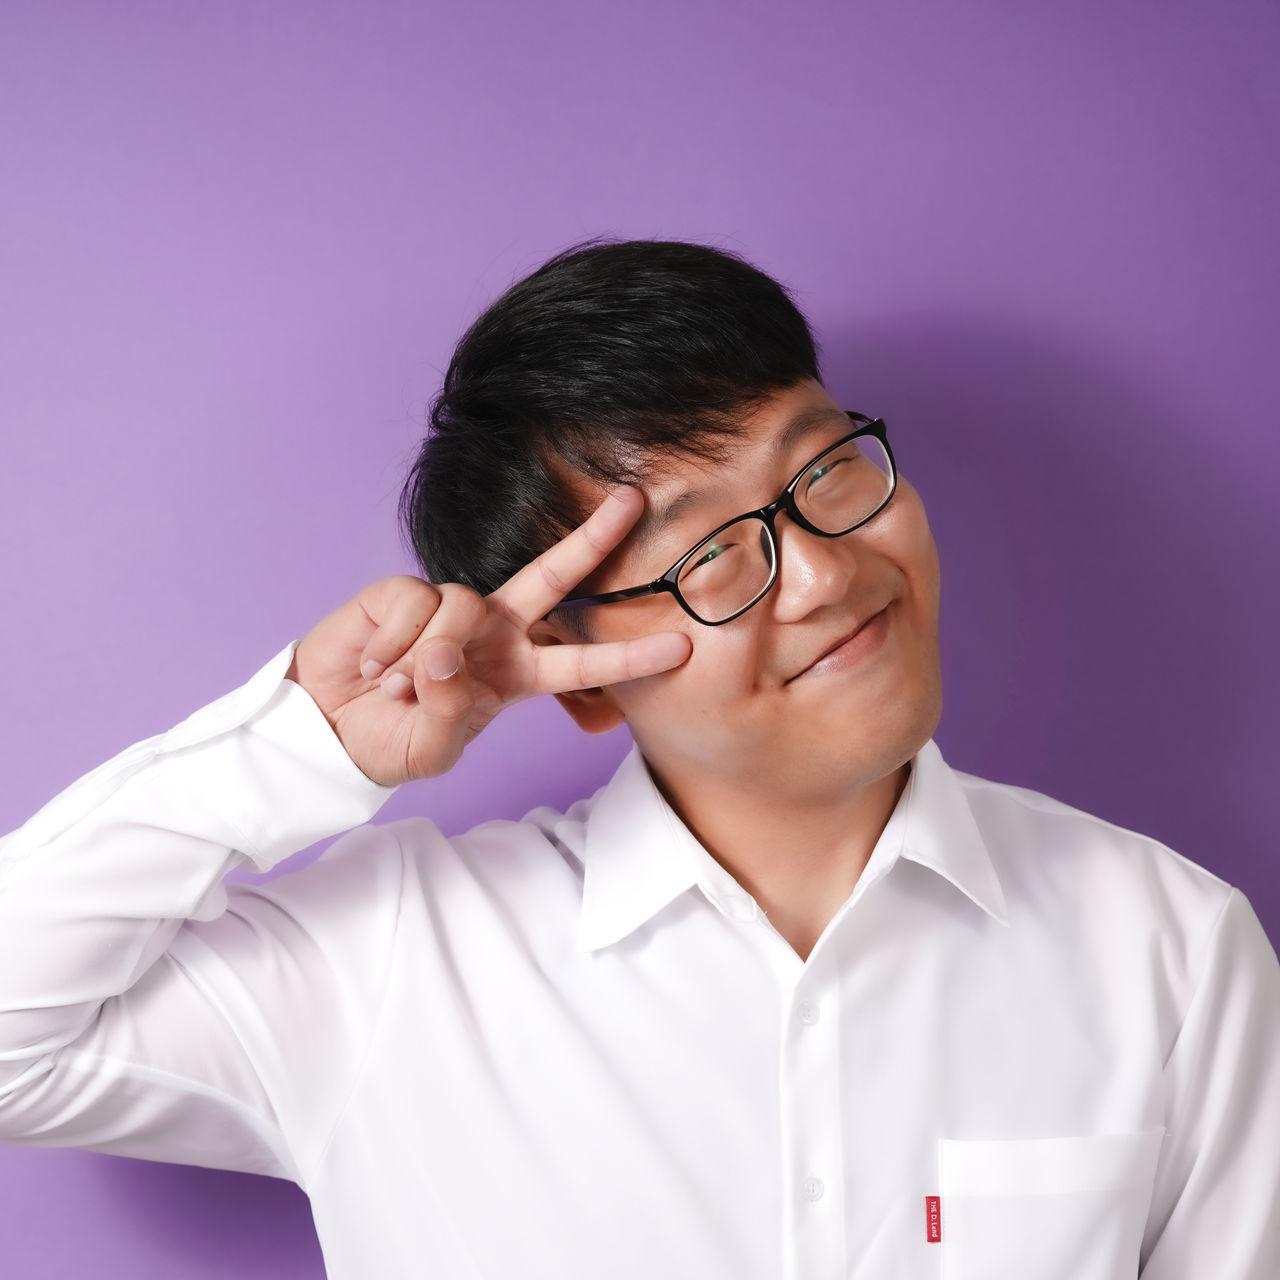 <b>Kang Sung Gil</b><br>Lead Fundraiser<br>